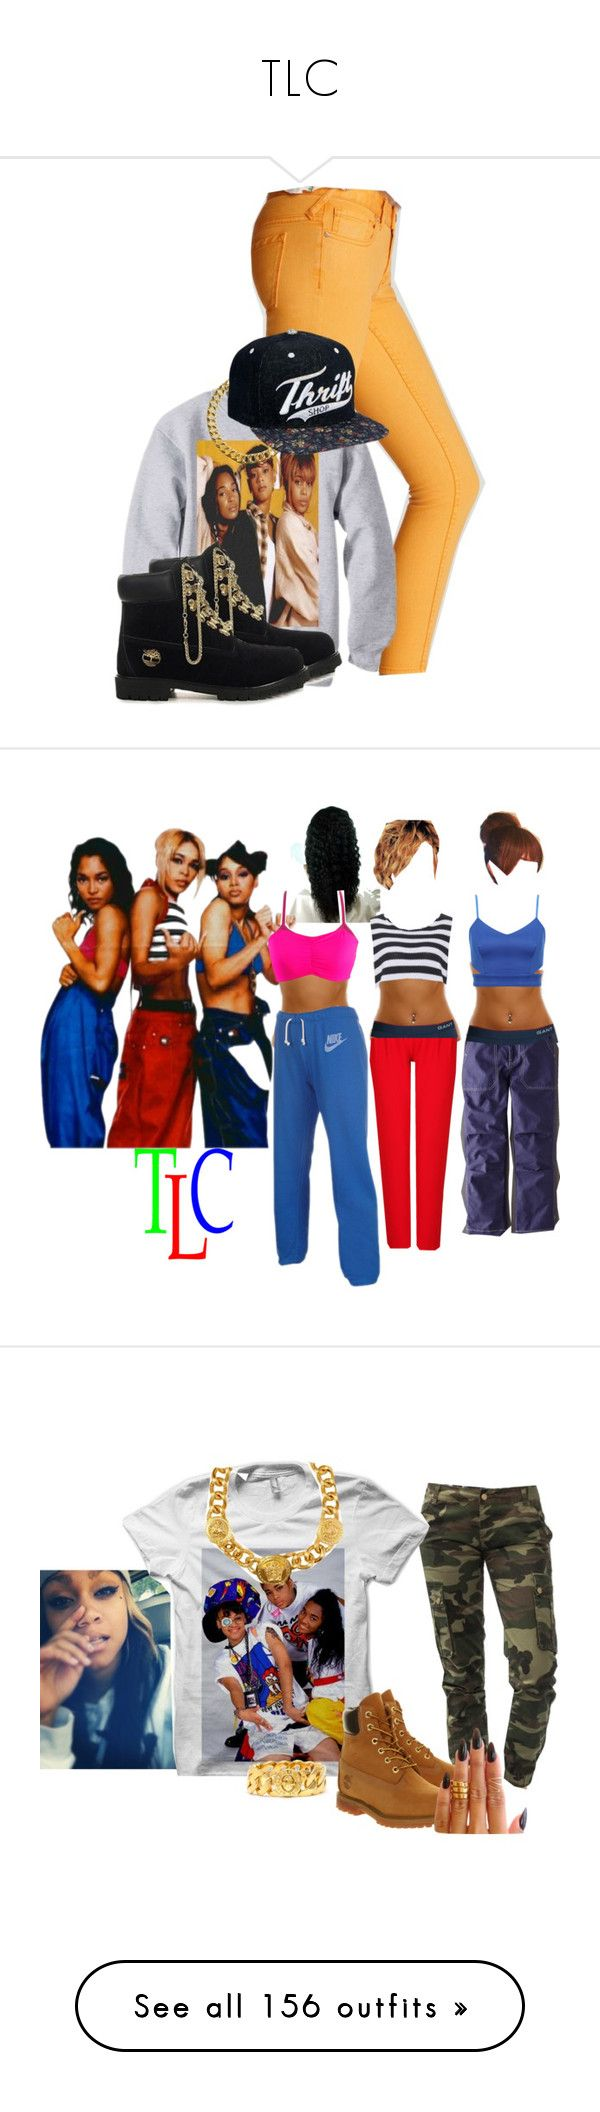 """TLC"" by yasminerihanna ❤ liked on Polyvore featuring Free People, Gogo Philip, Zephyr, Miu Miu, GANT, NIKE, MANGO, Johnnie b, itryed and Timberland"